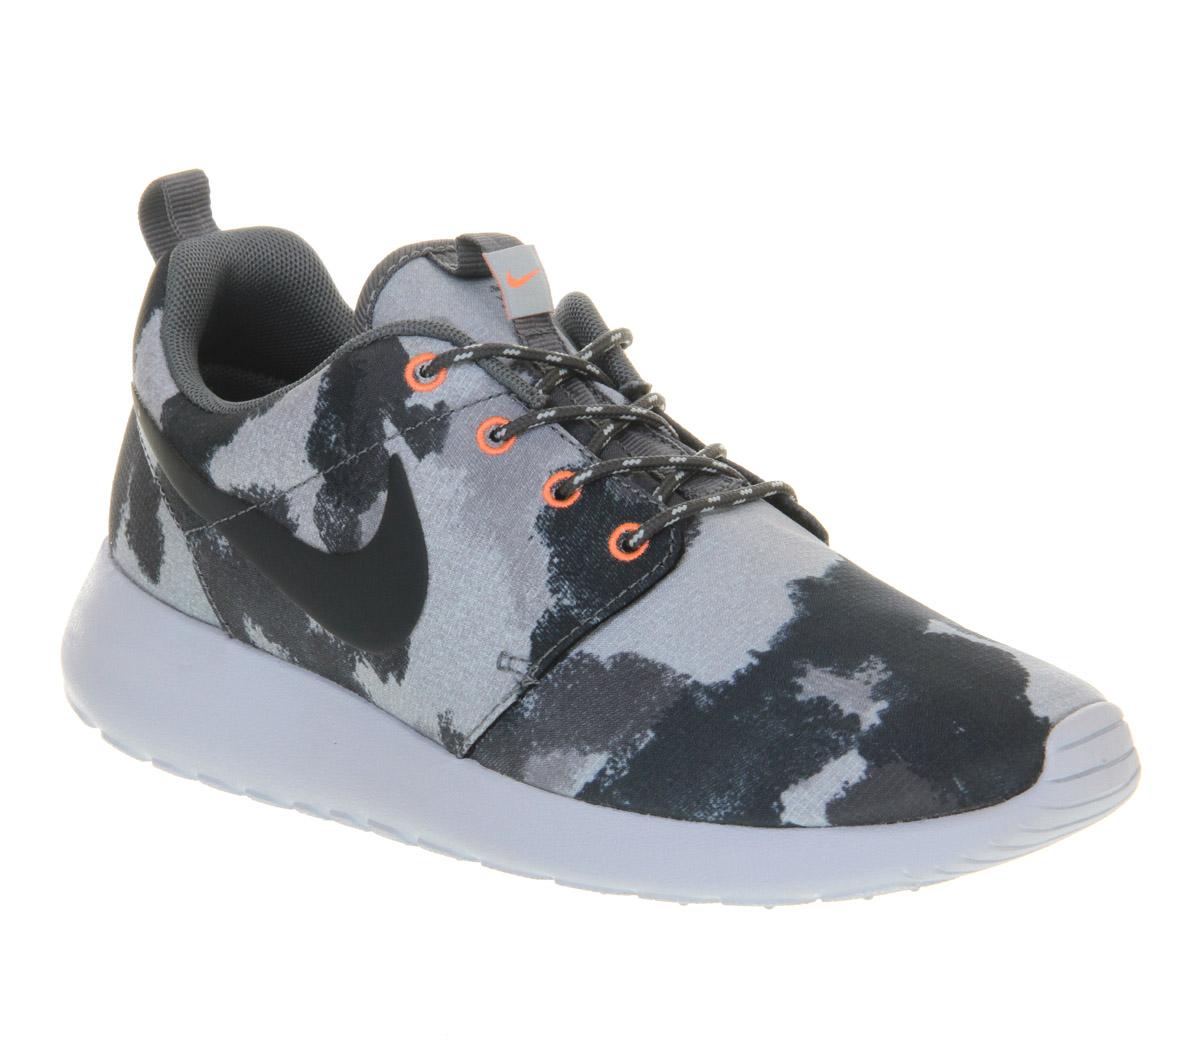 the best attitude afc09 8d593 Nike Roshe Run Army Slate Camo - Unisex Sports